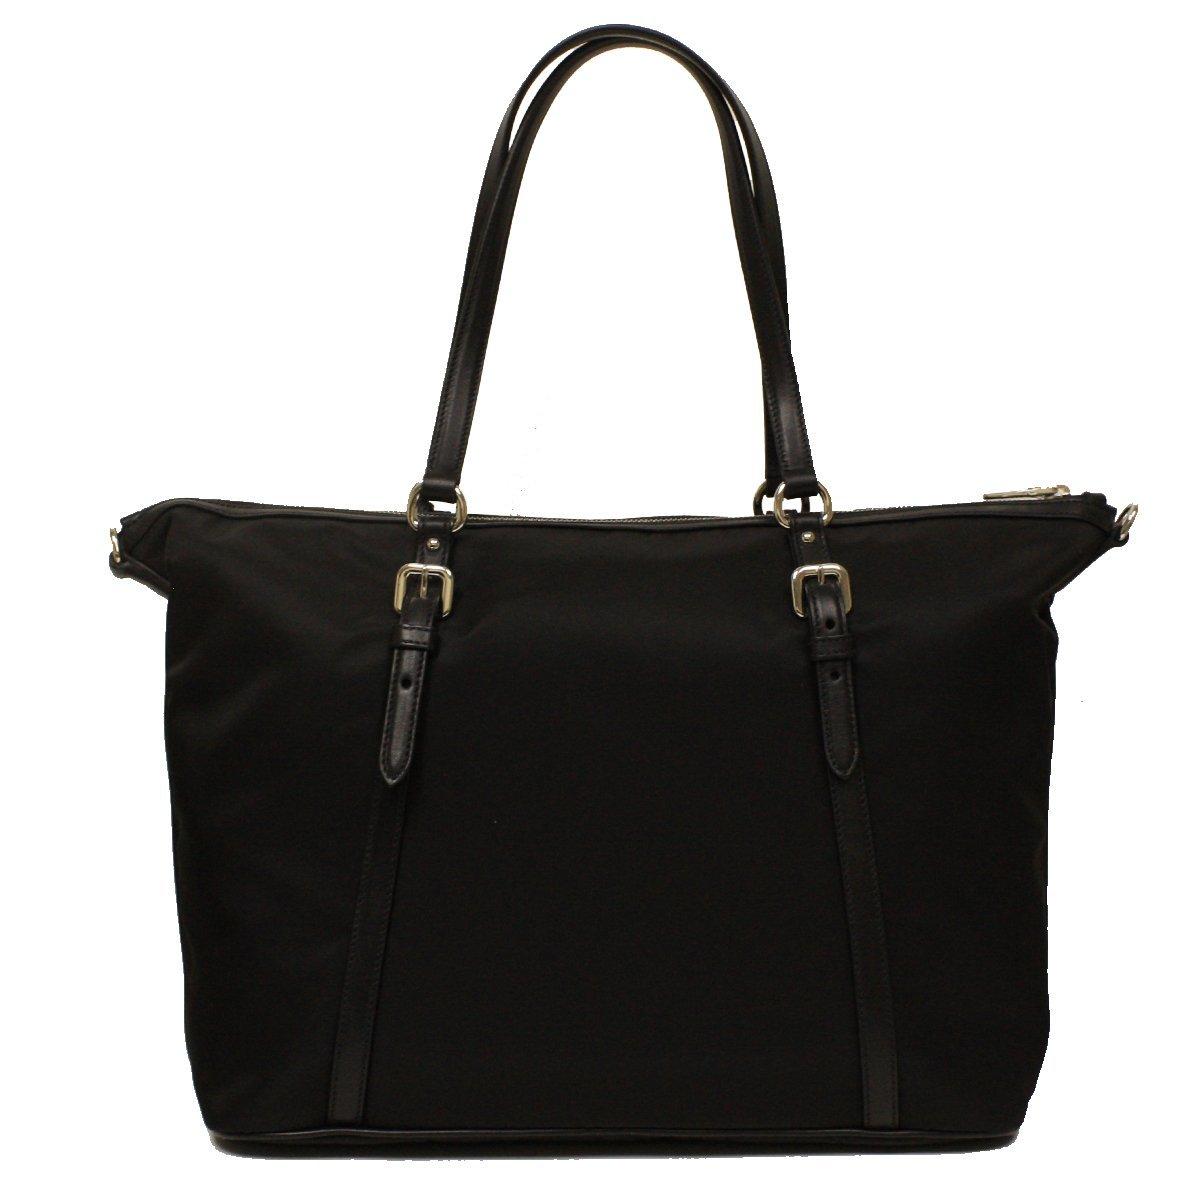 53ca9612a0888 Prada B4253M Nero Black Tessuto Soft Calf Nylon and Leather Shopping Tote  Bag  Amazon.ca  Shoes   Handbags